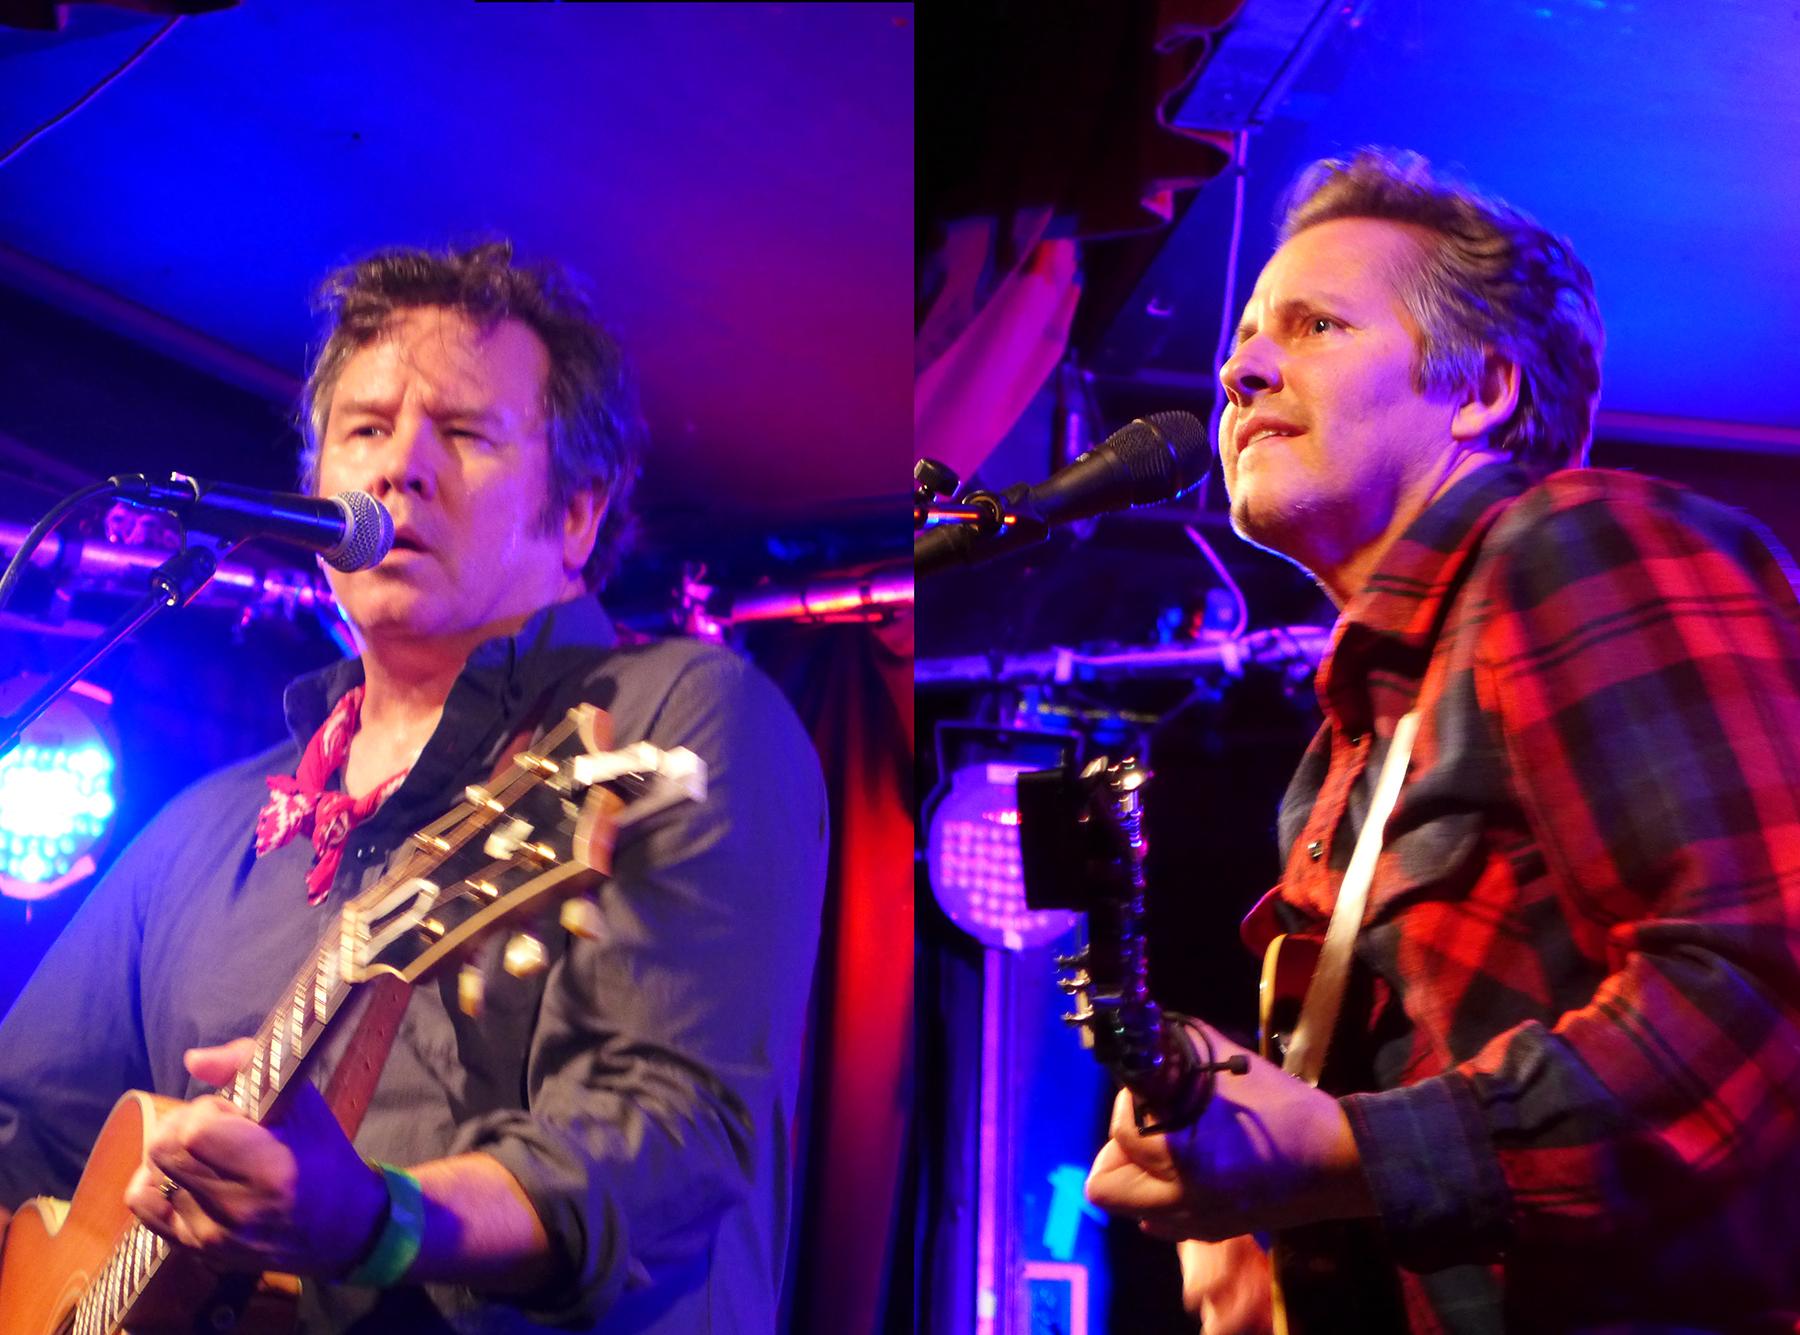 Josh Rouse and Grant Lee Phillips @ Whelan's, Dublin - 30th